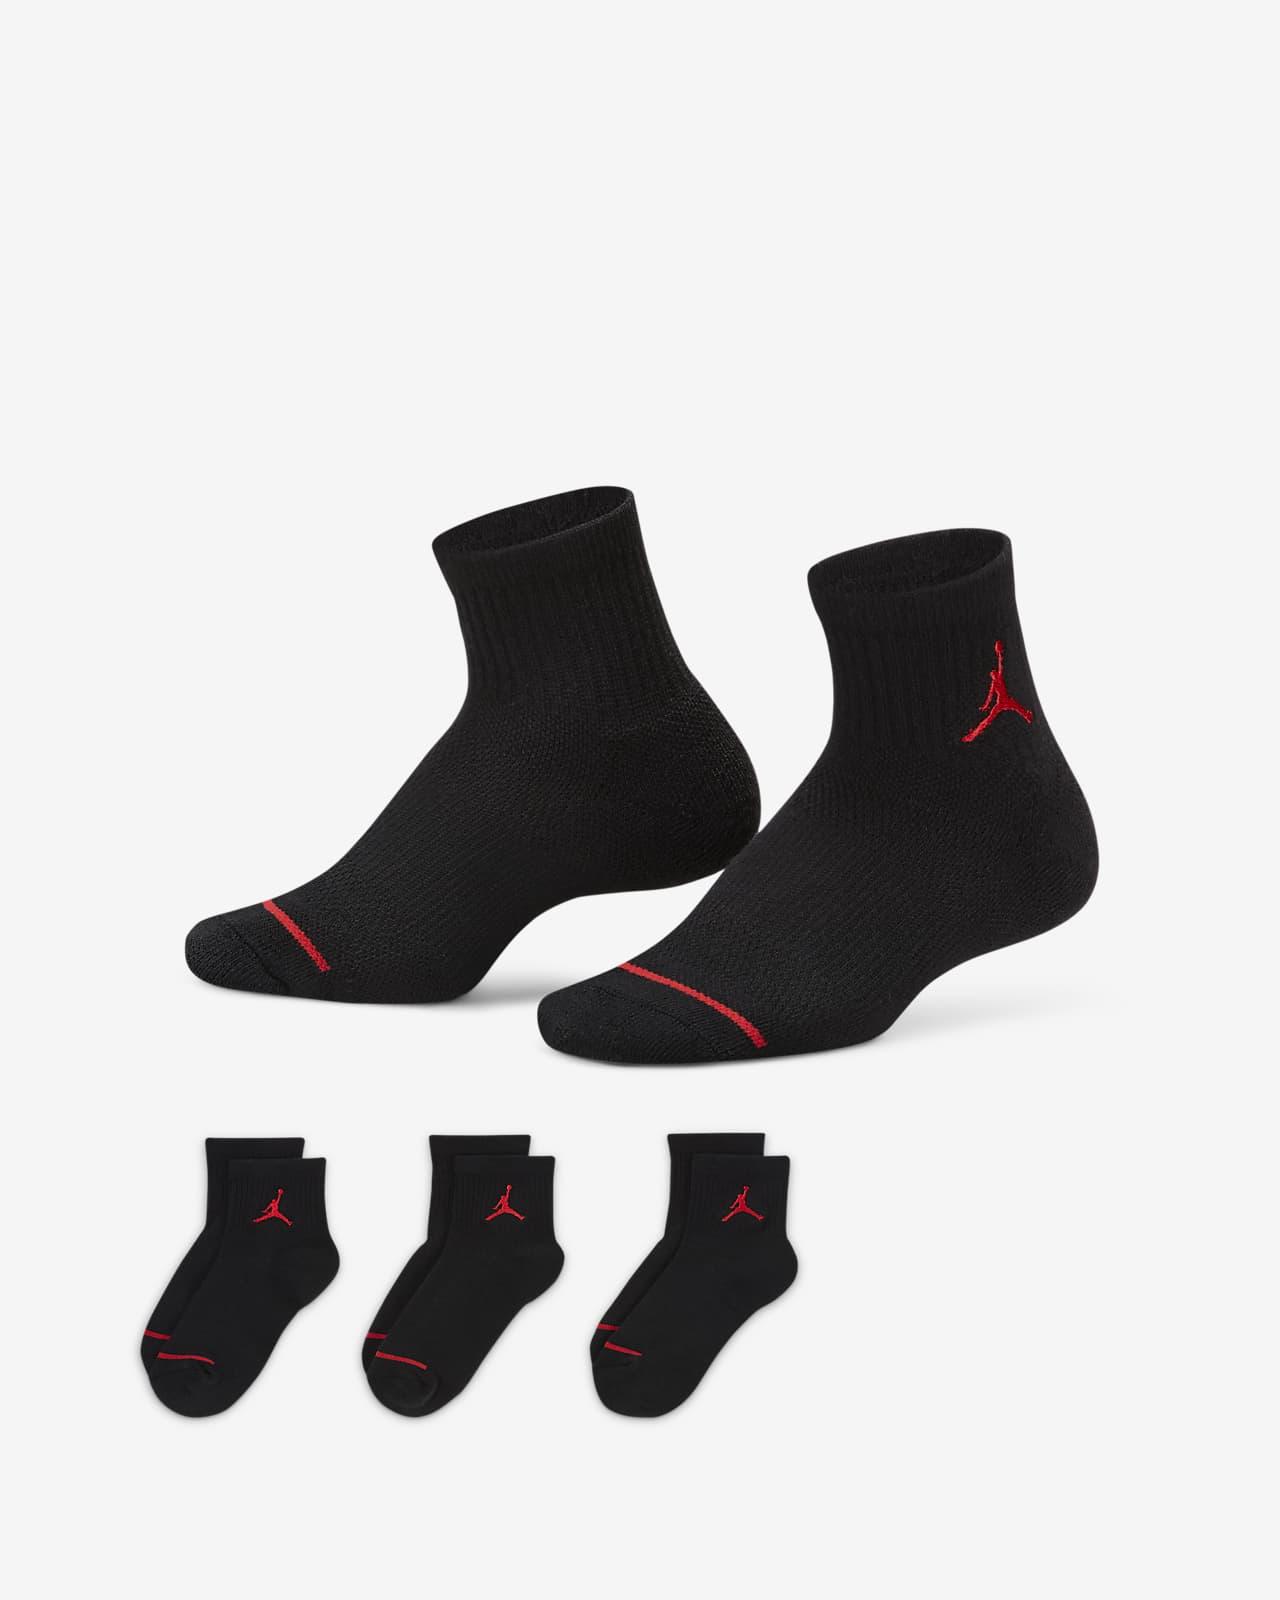 Jordan Jumpman Little Kids' Ankle Socks (3 Pairs)